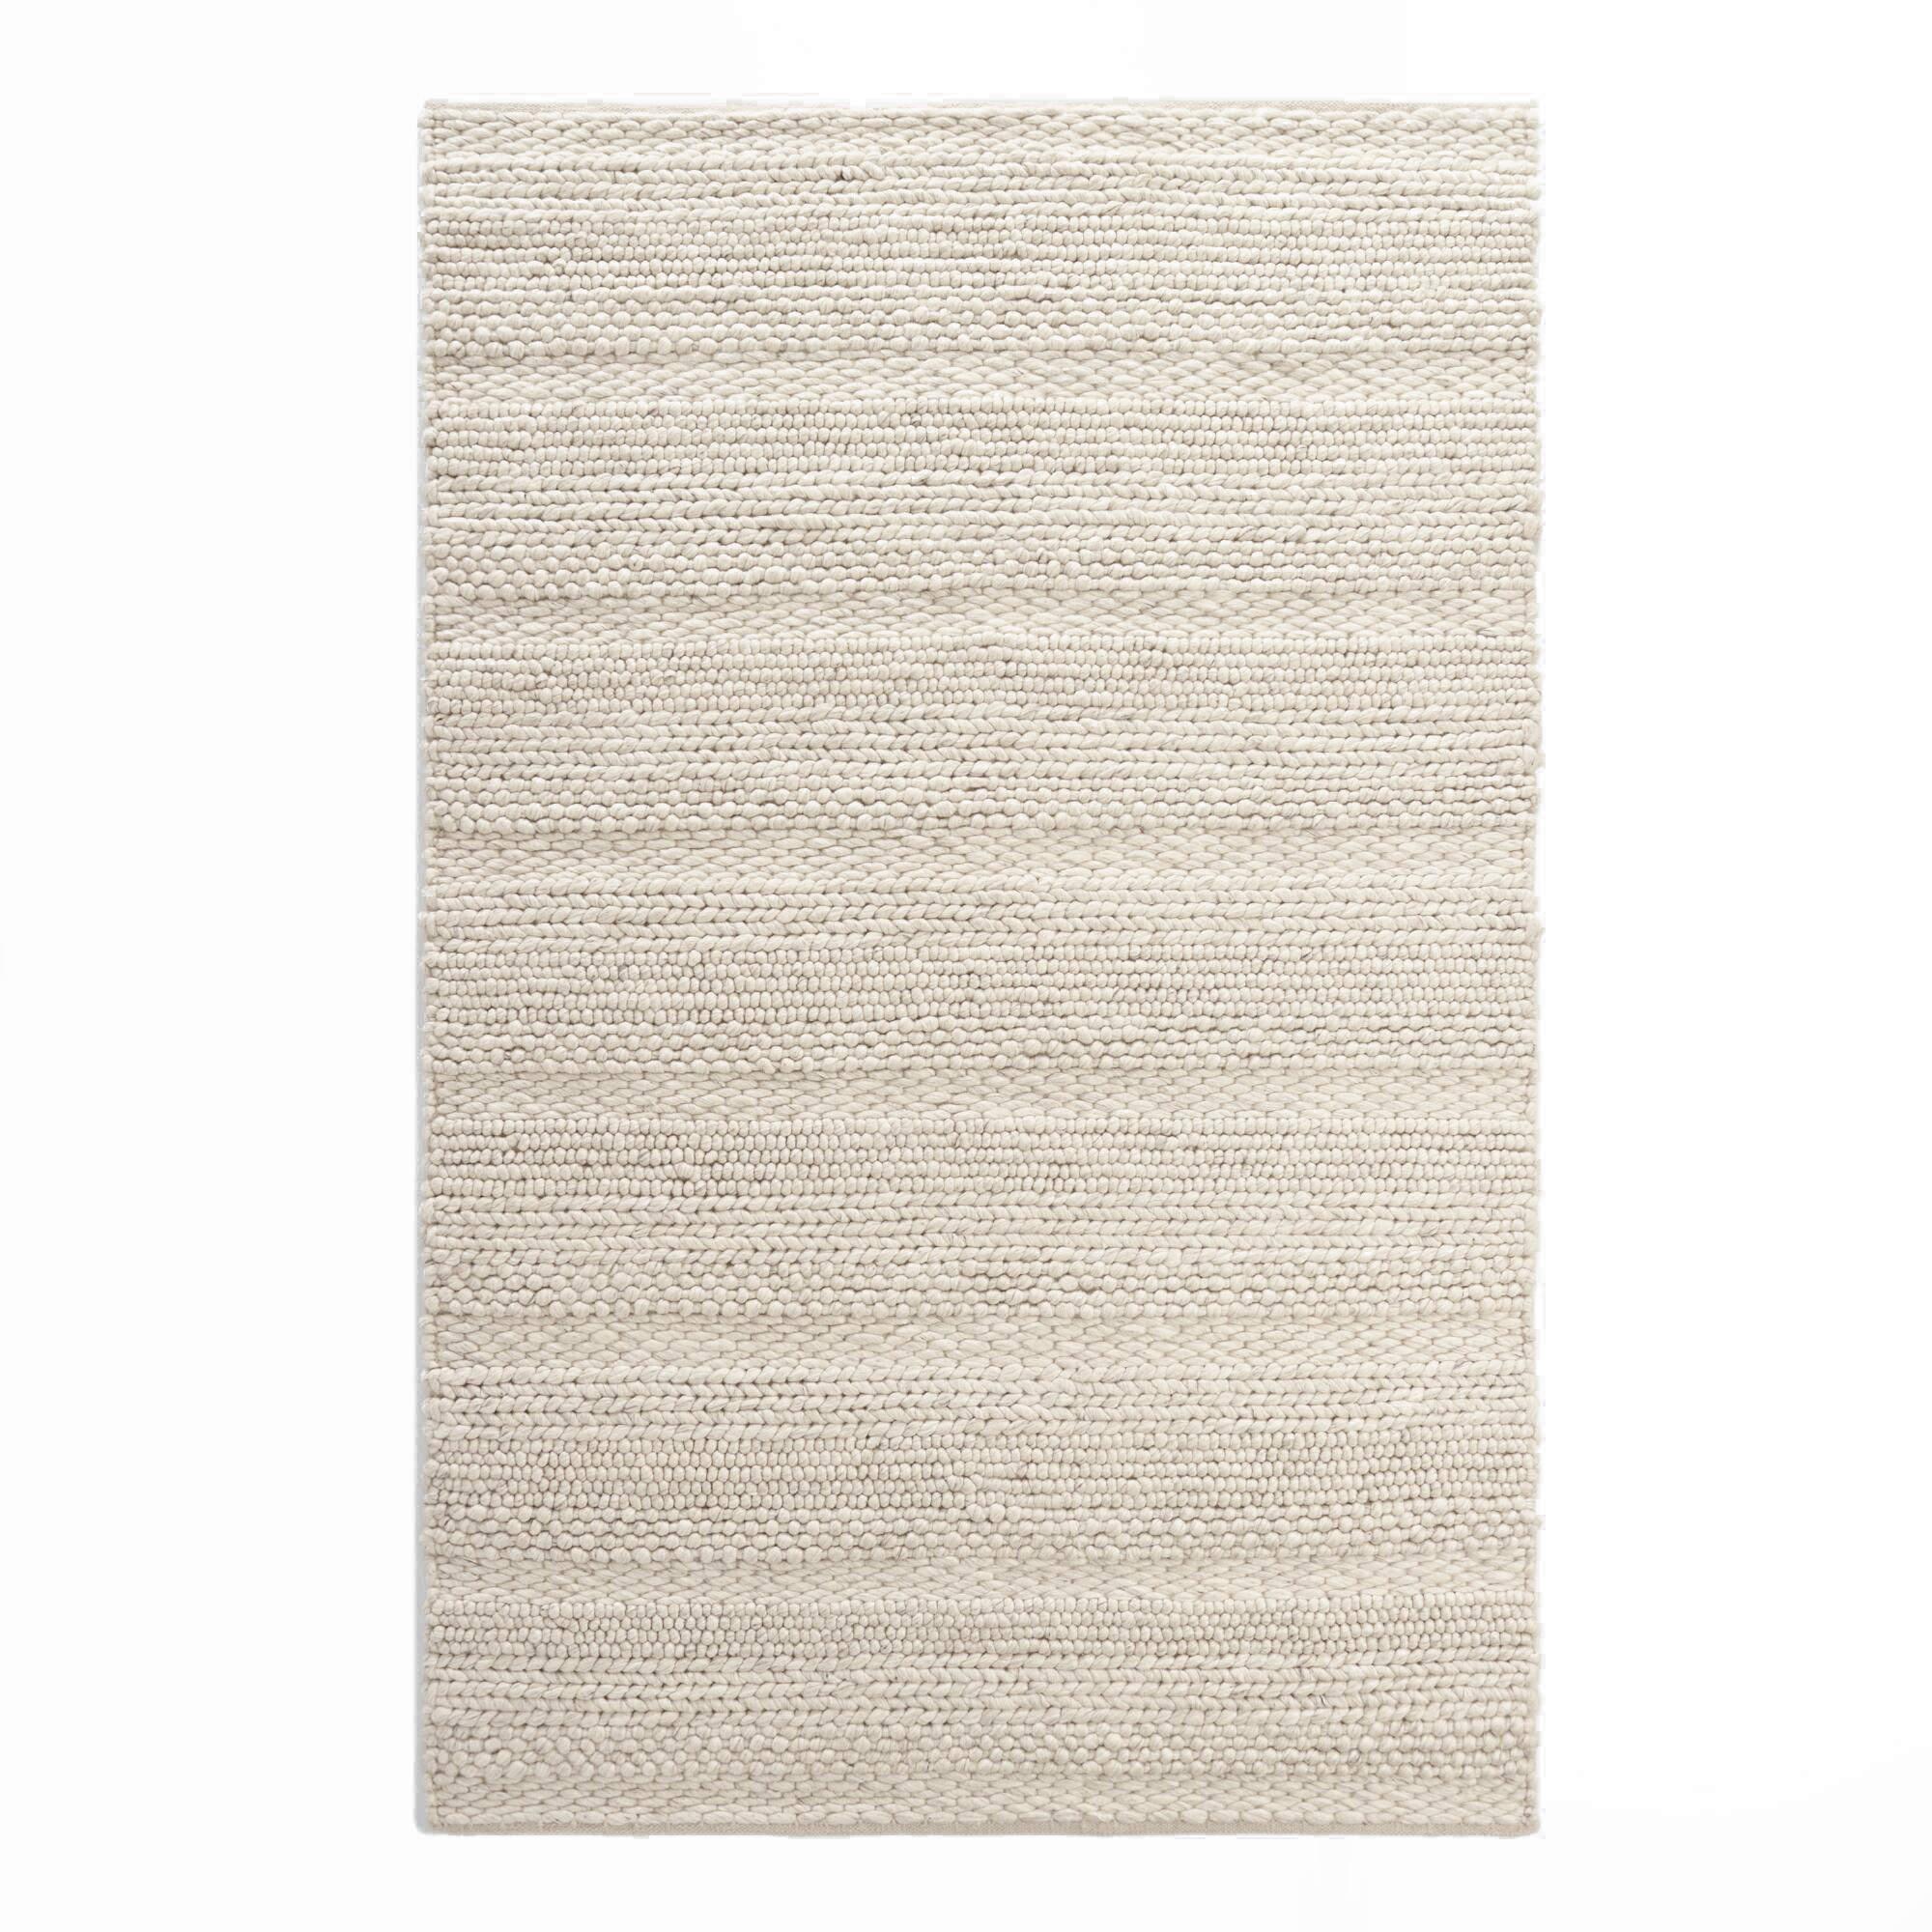 cream-rug-world-market-2.jpg